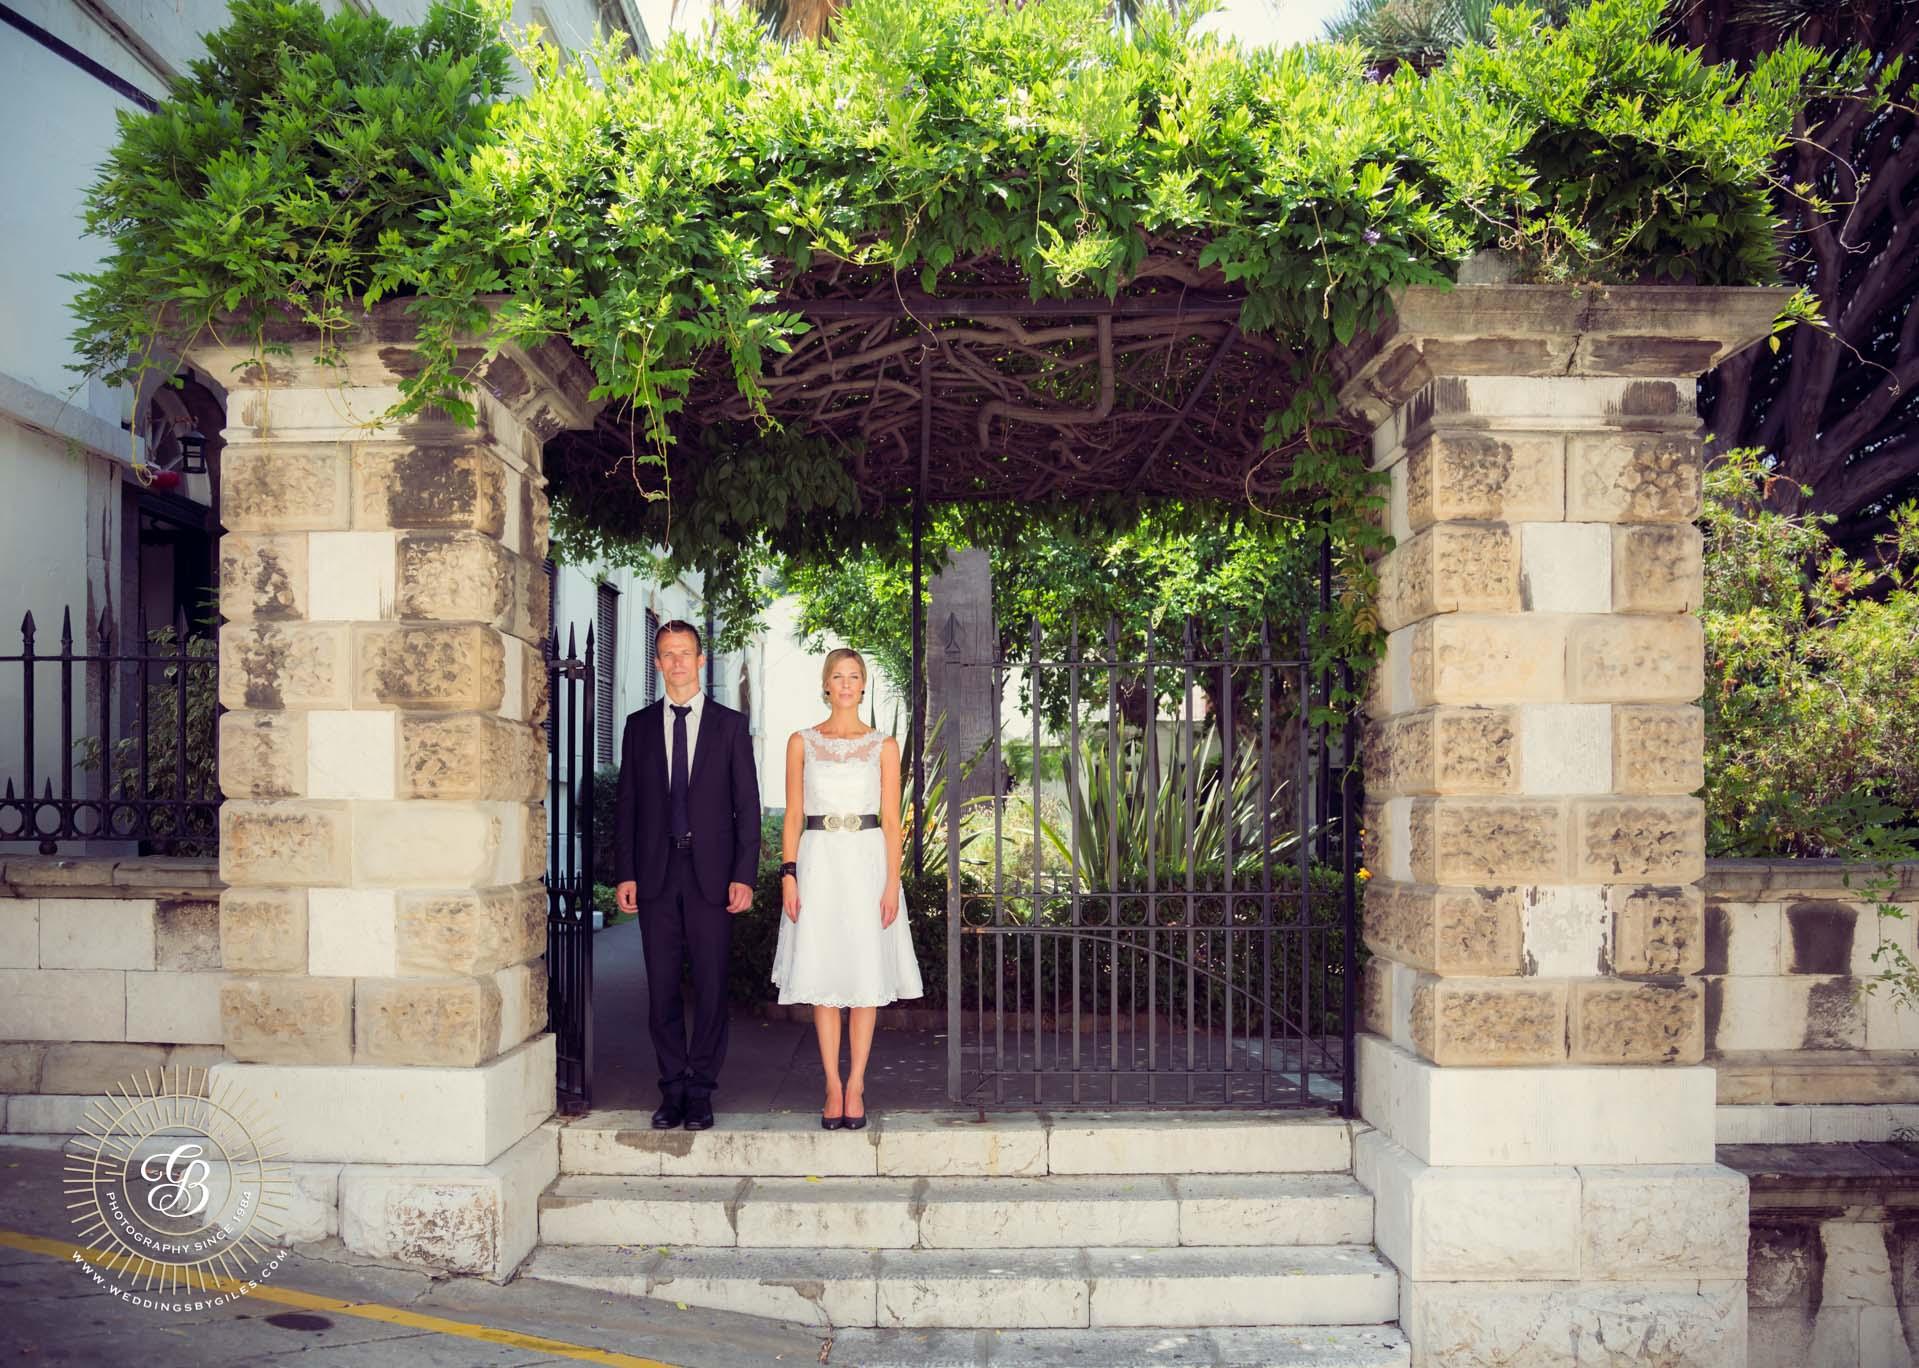 Wedding photoshoot at the Garison Library Gibraltar